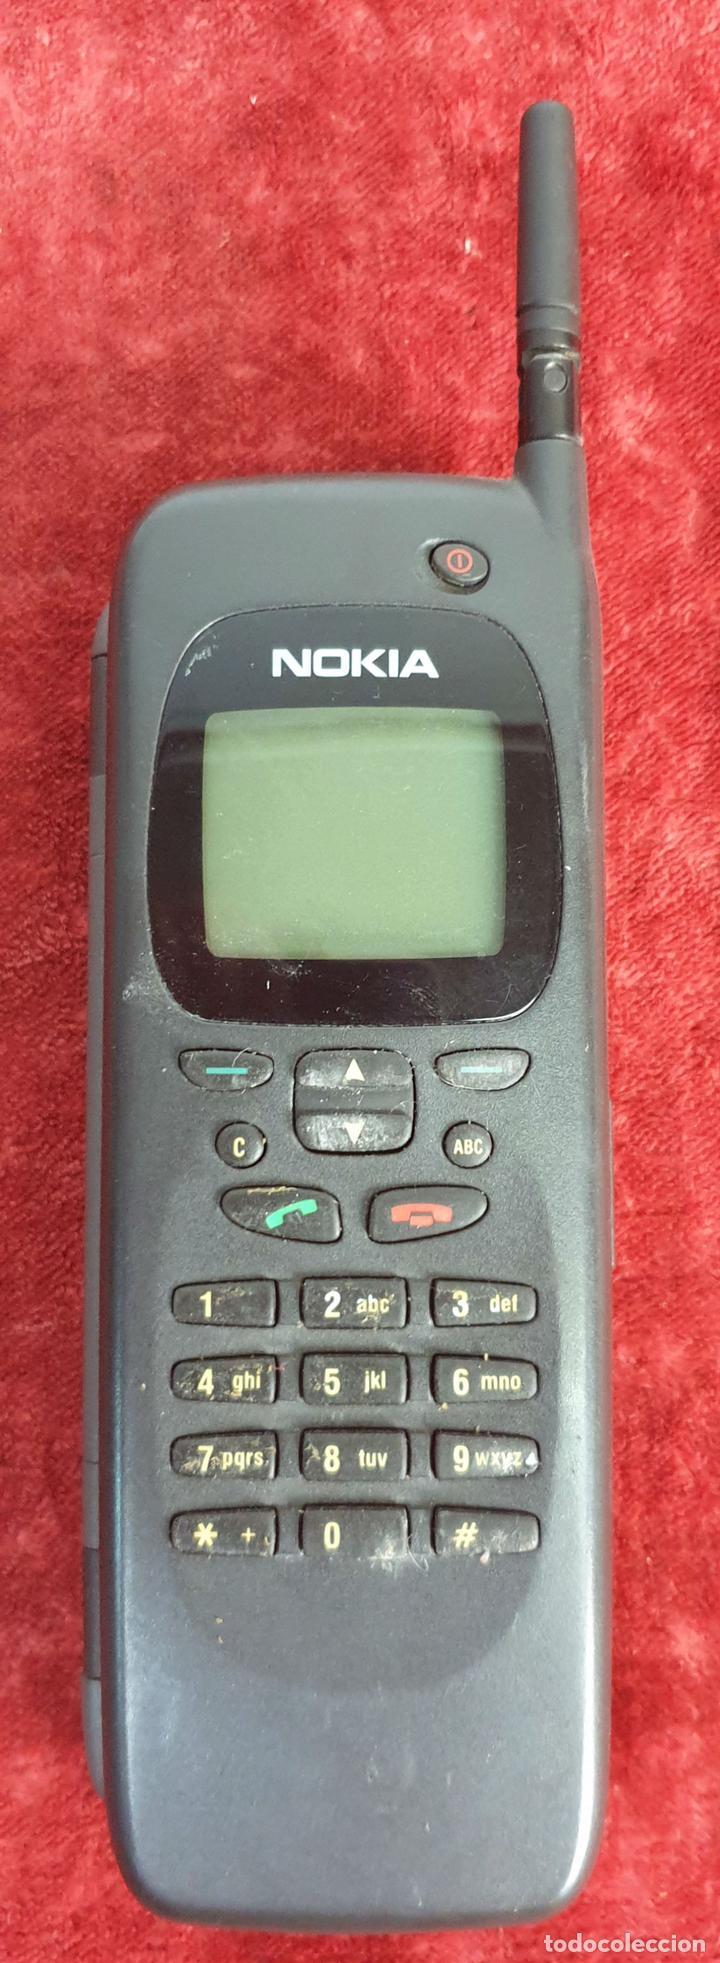 TELÉFONO MÓVIL PDA. NOKIA 9000. MODELO RAE-1N. JAPON. 1996. (Coleccionismo - Varios)